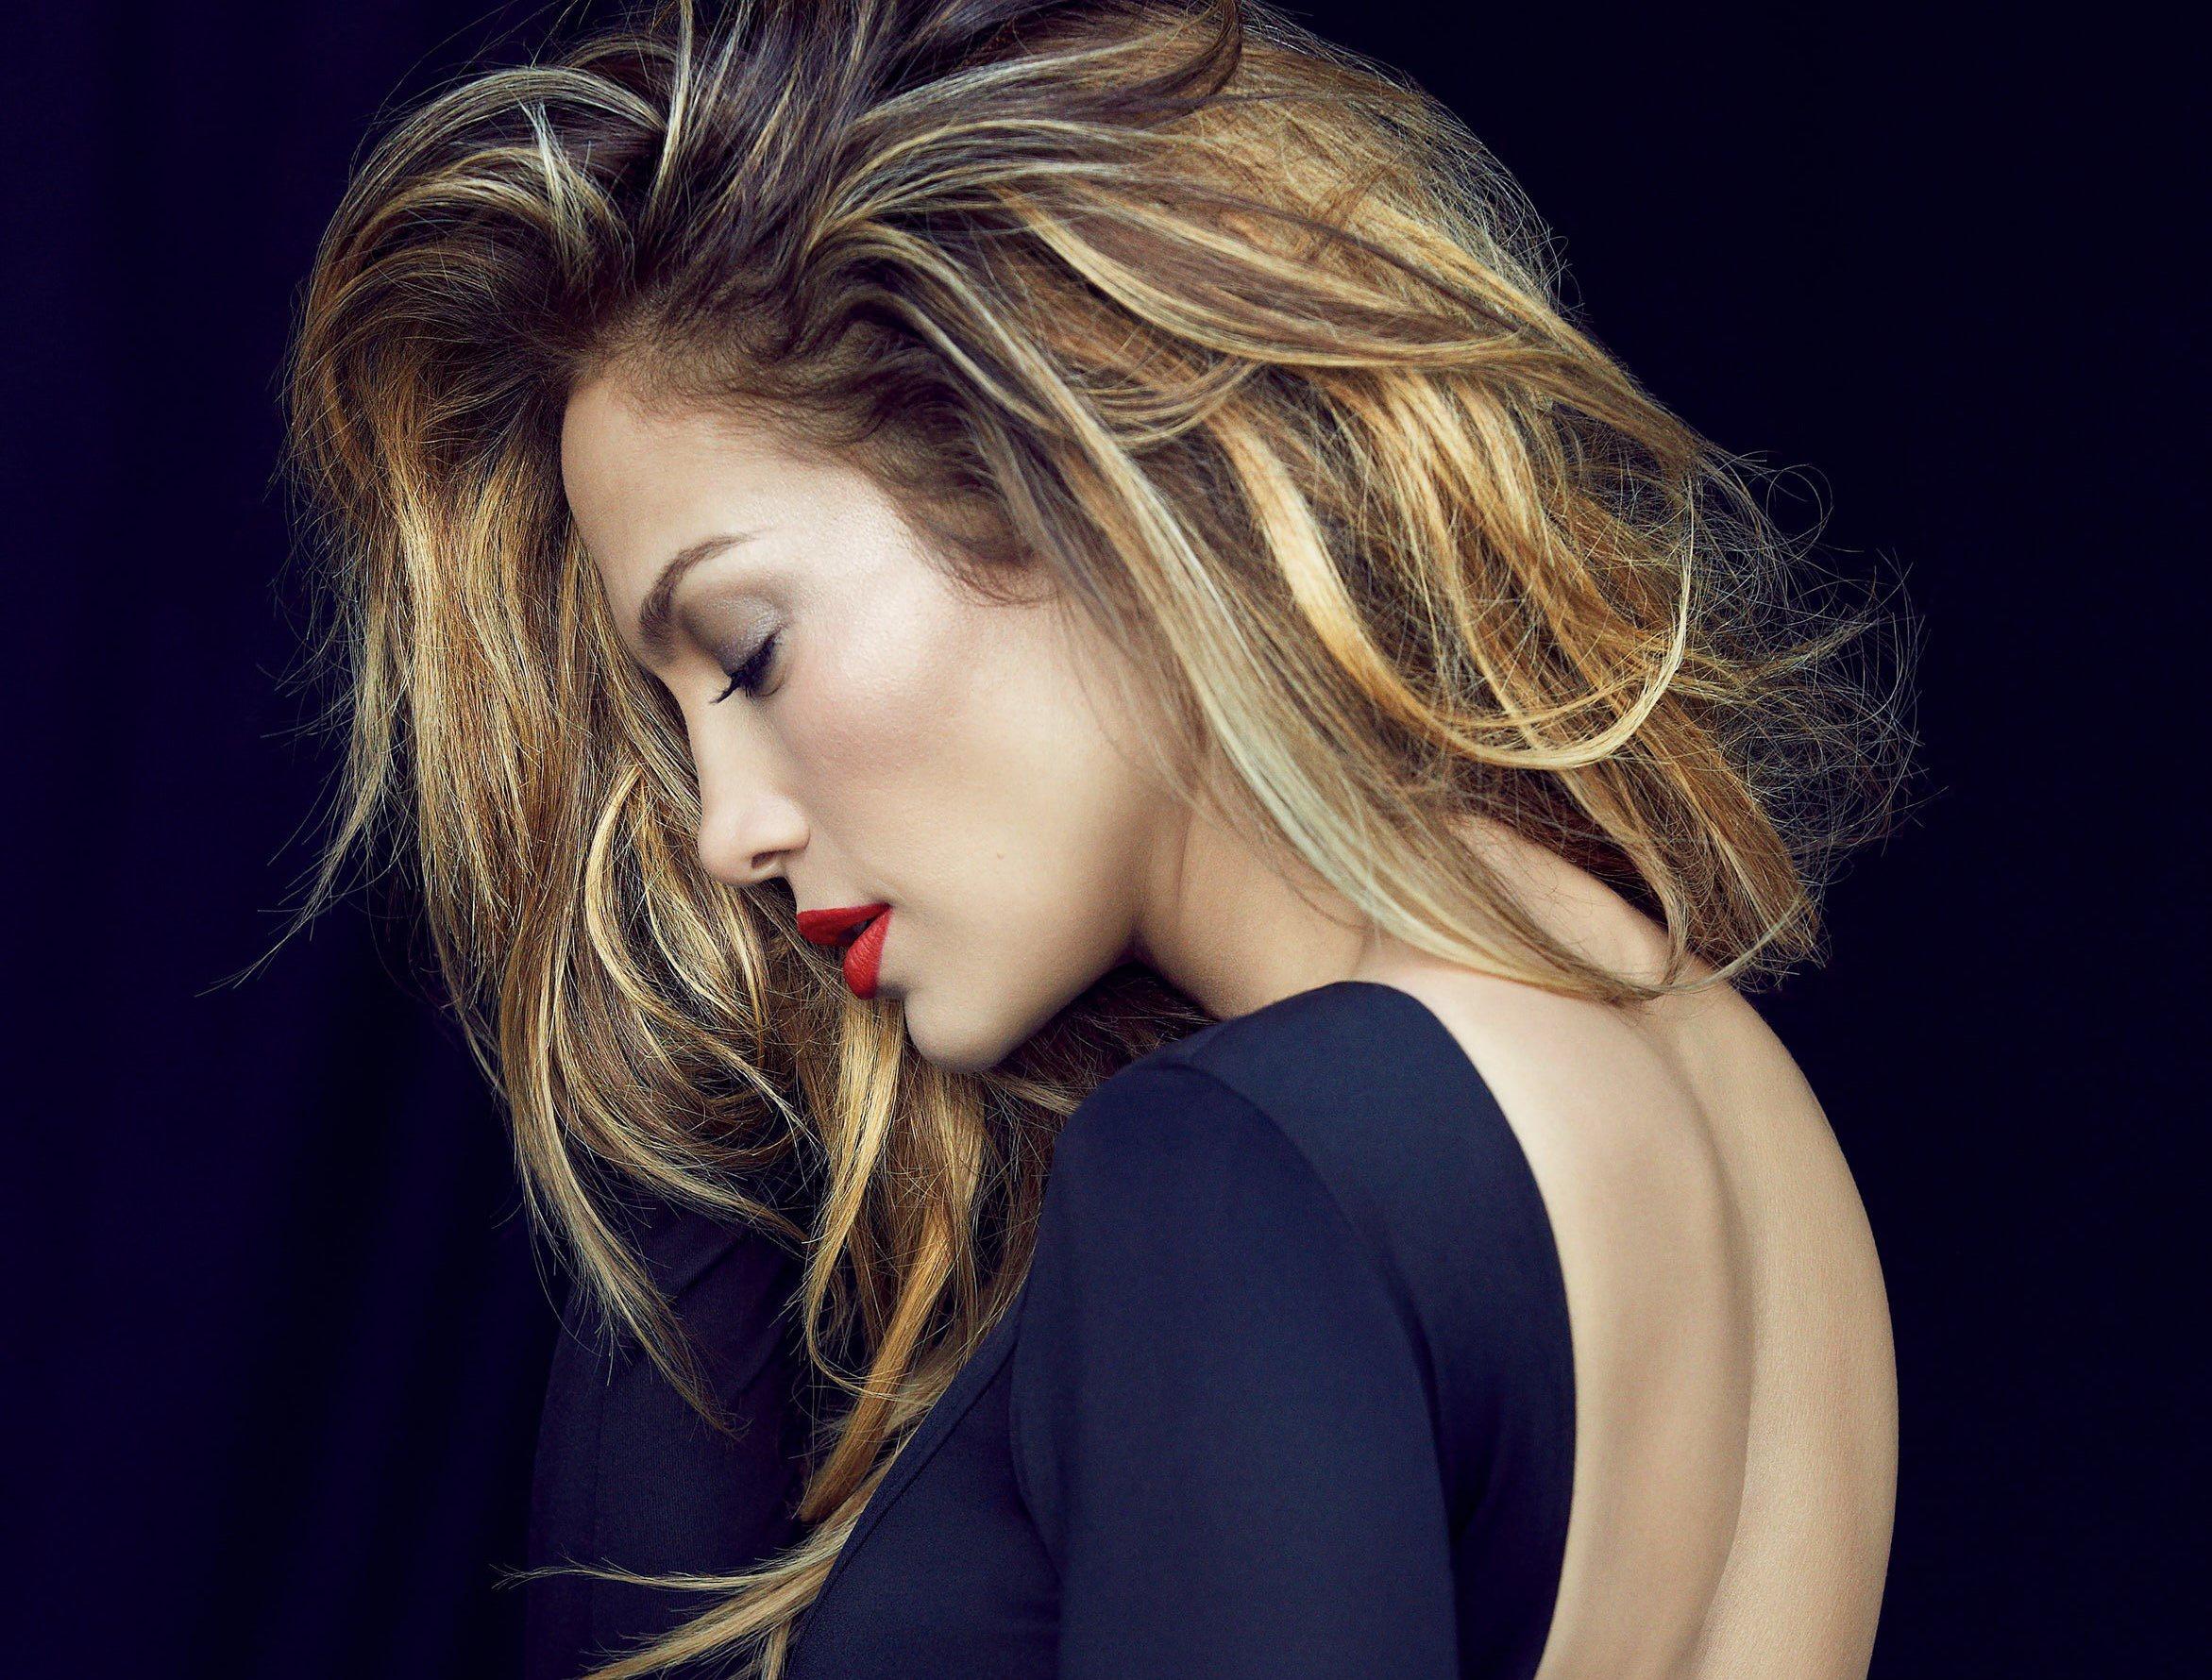 Jennifer Lopez Jlo Hair Color 2019 438249 Hd Wallpaper Backgrounds Download